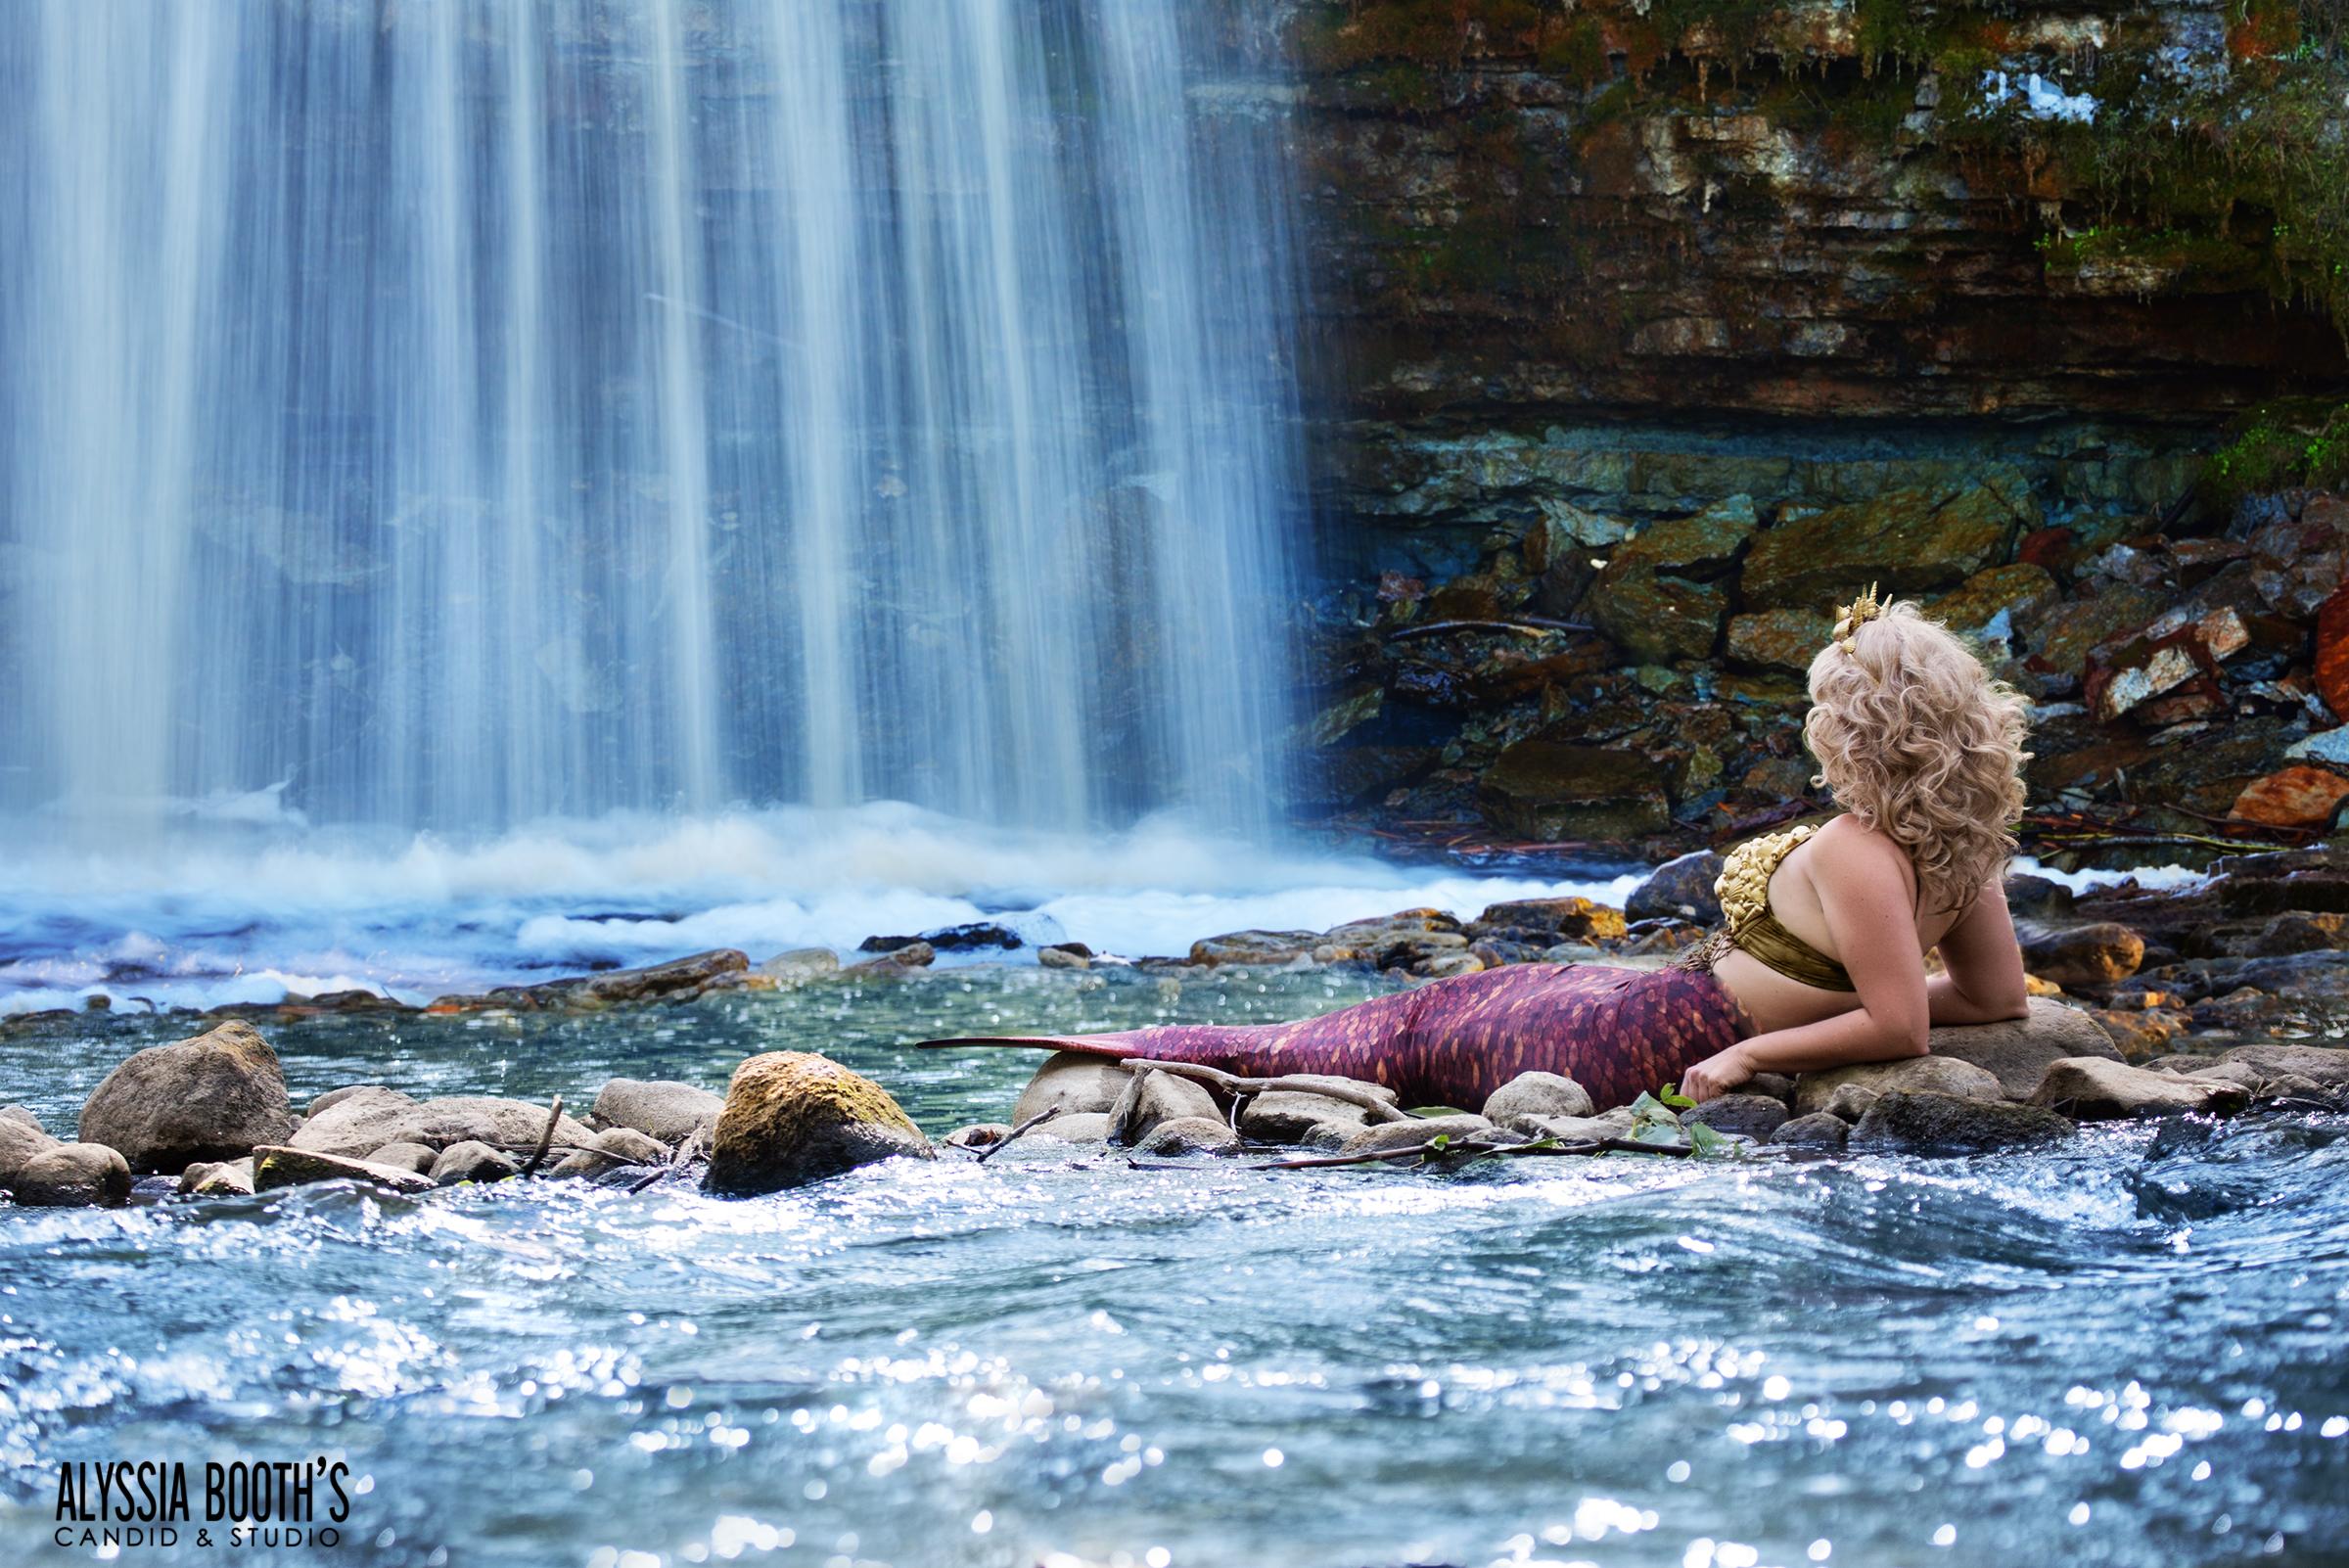 Mermaid Lagoon   Alyssia Booth's Candid & Studio   East Lansing Photographer